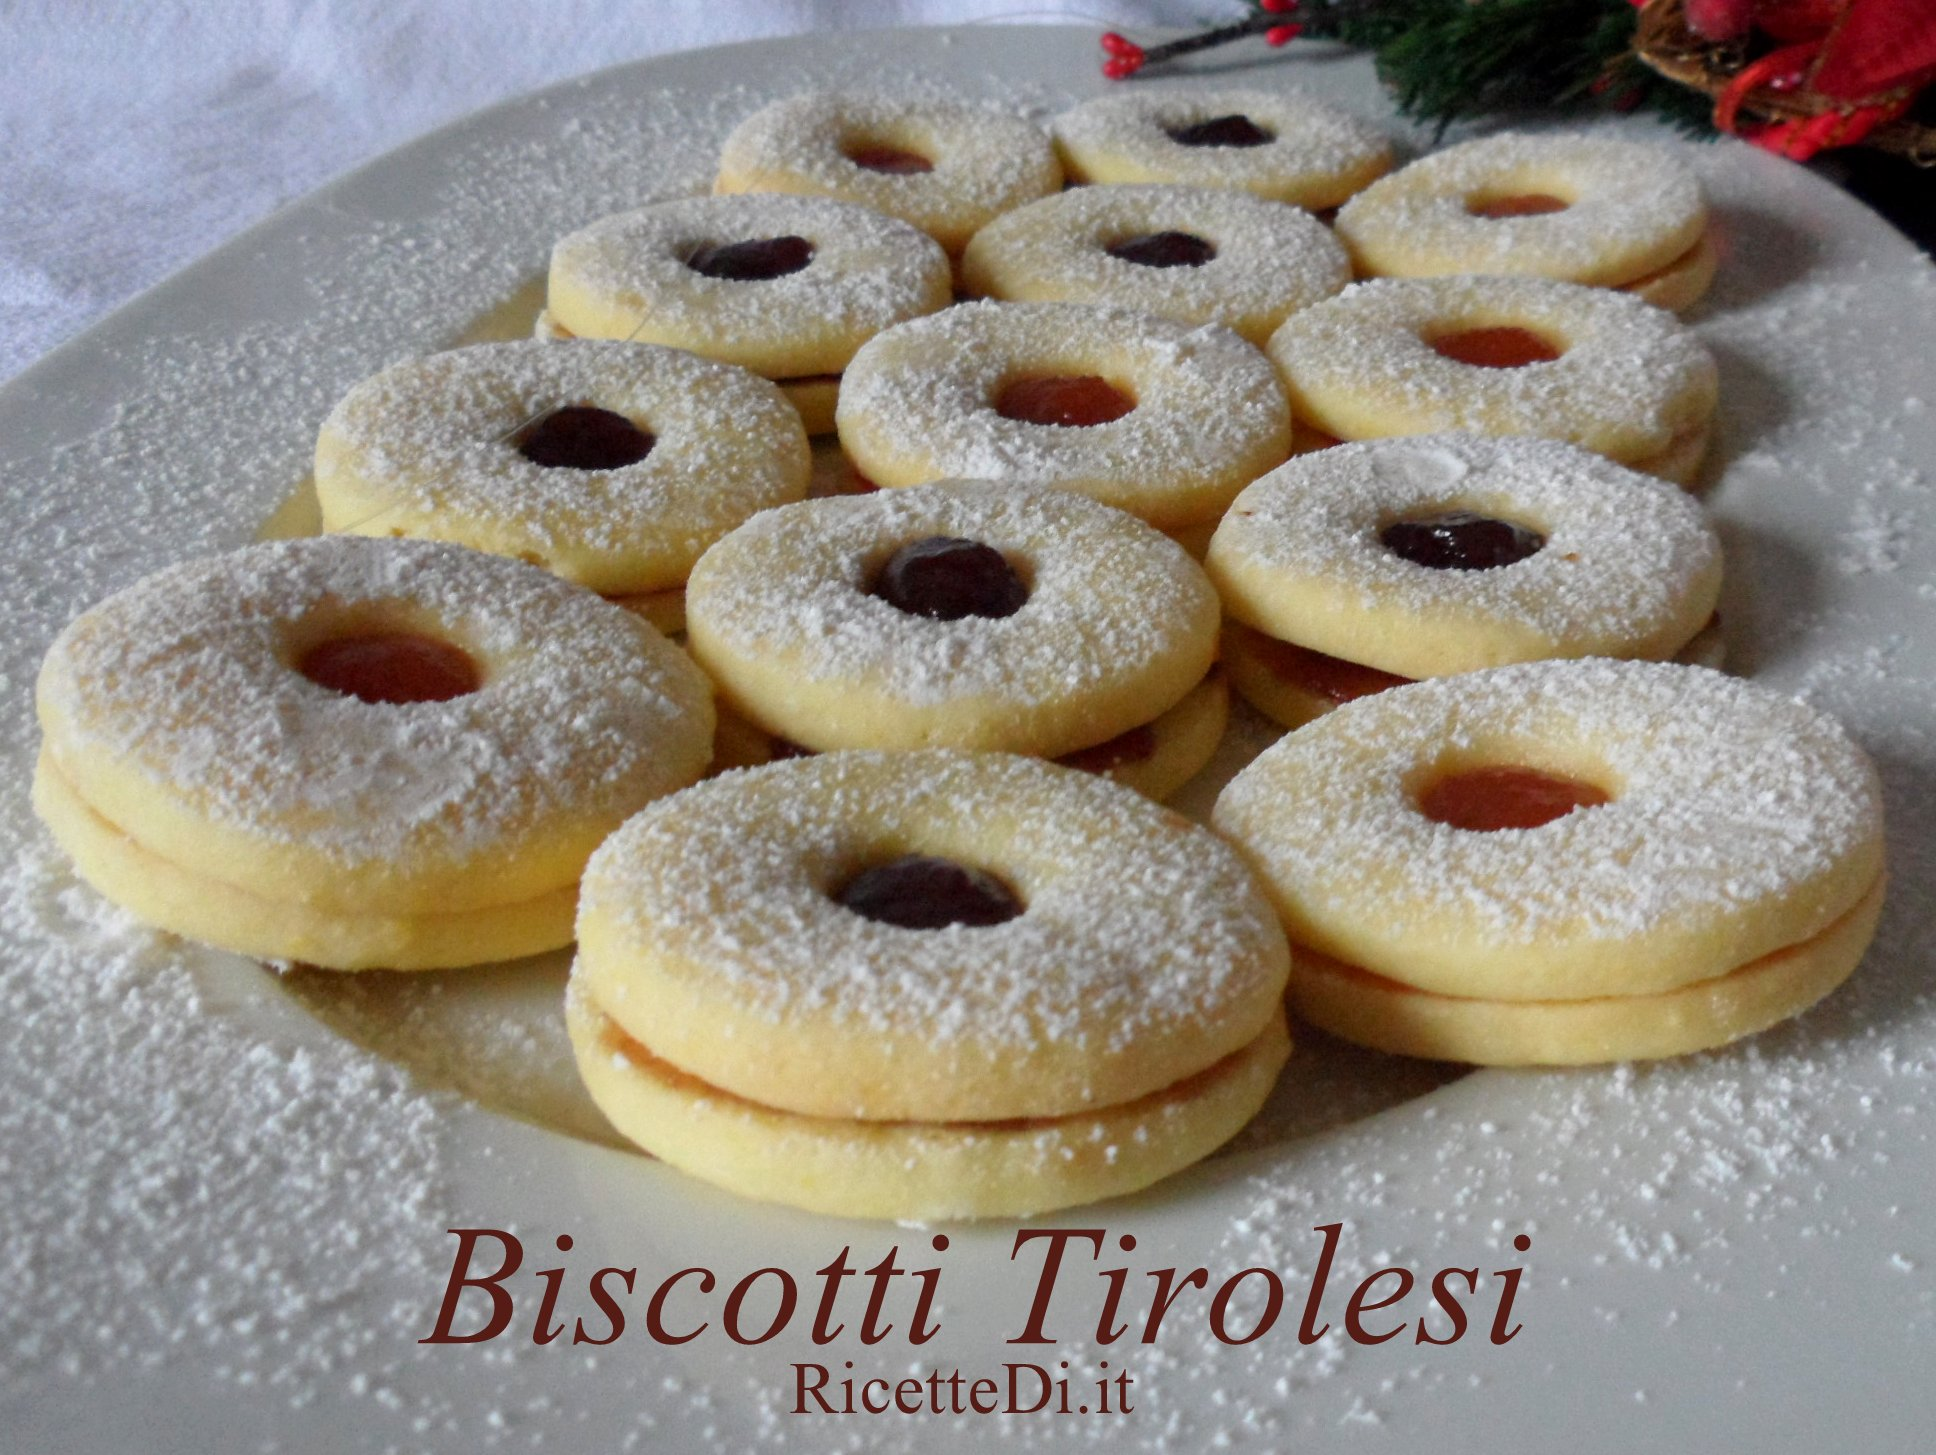 Biscotti Di Natale Tirolesi.Biscotti Tirolesi Ricettedi It